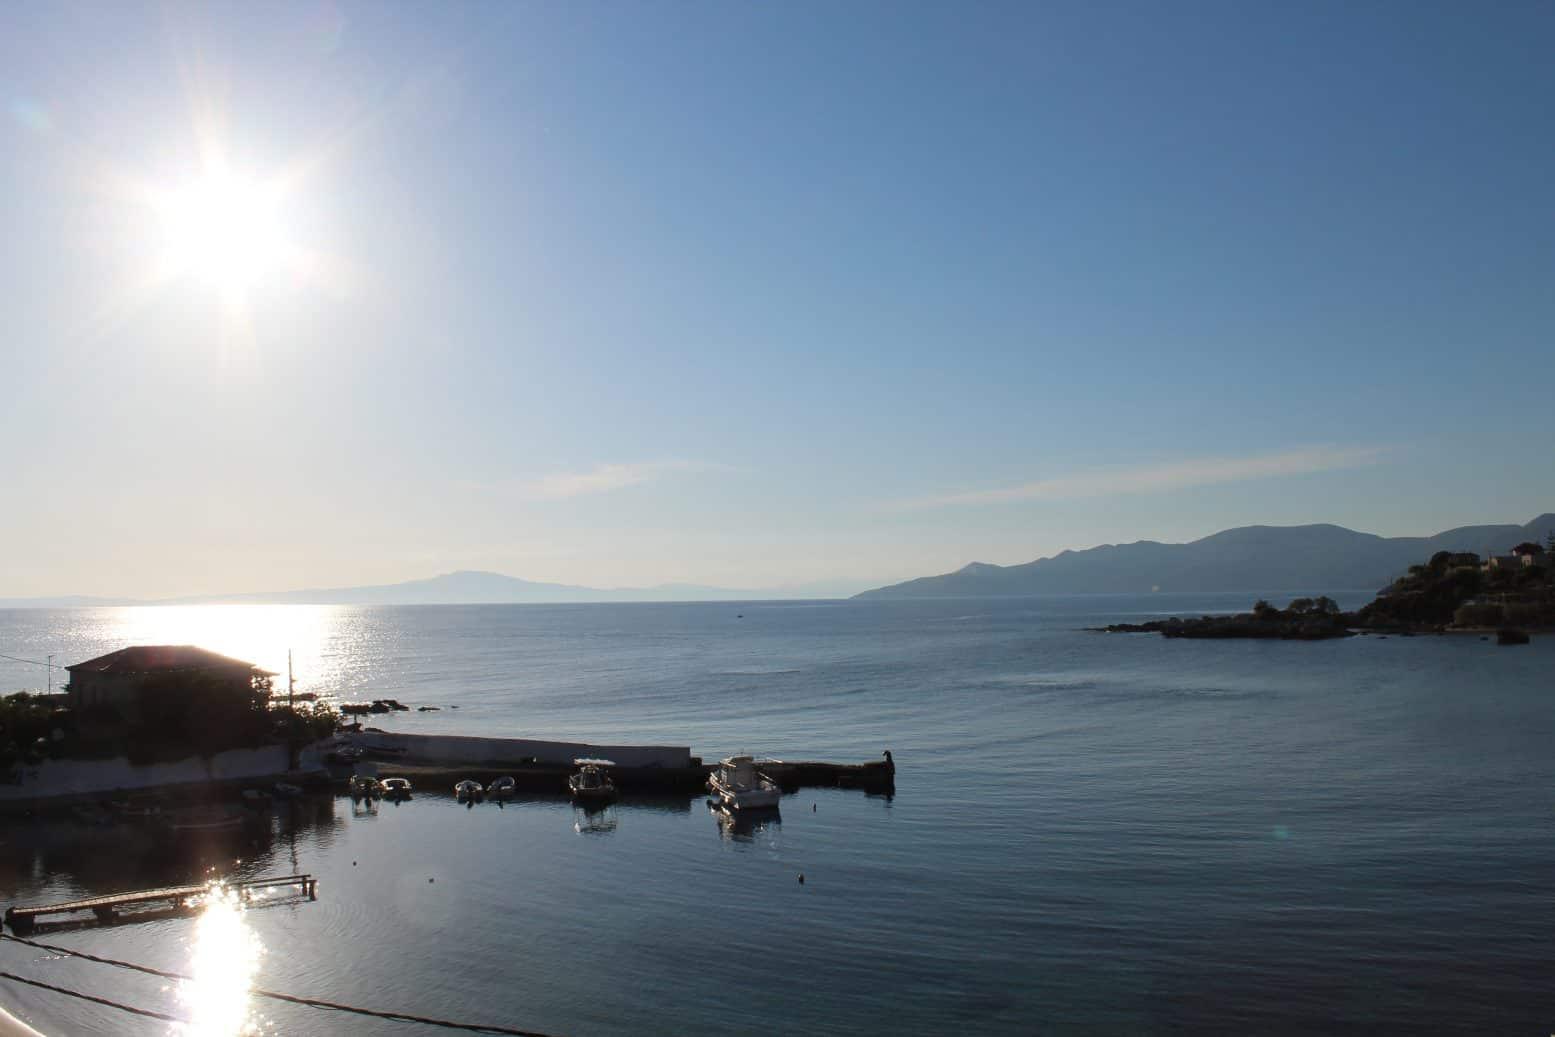 Bar 360 – Spectacular Views over Stoupa, Greece